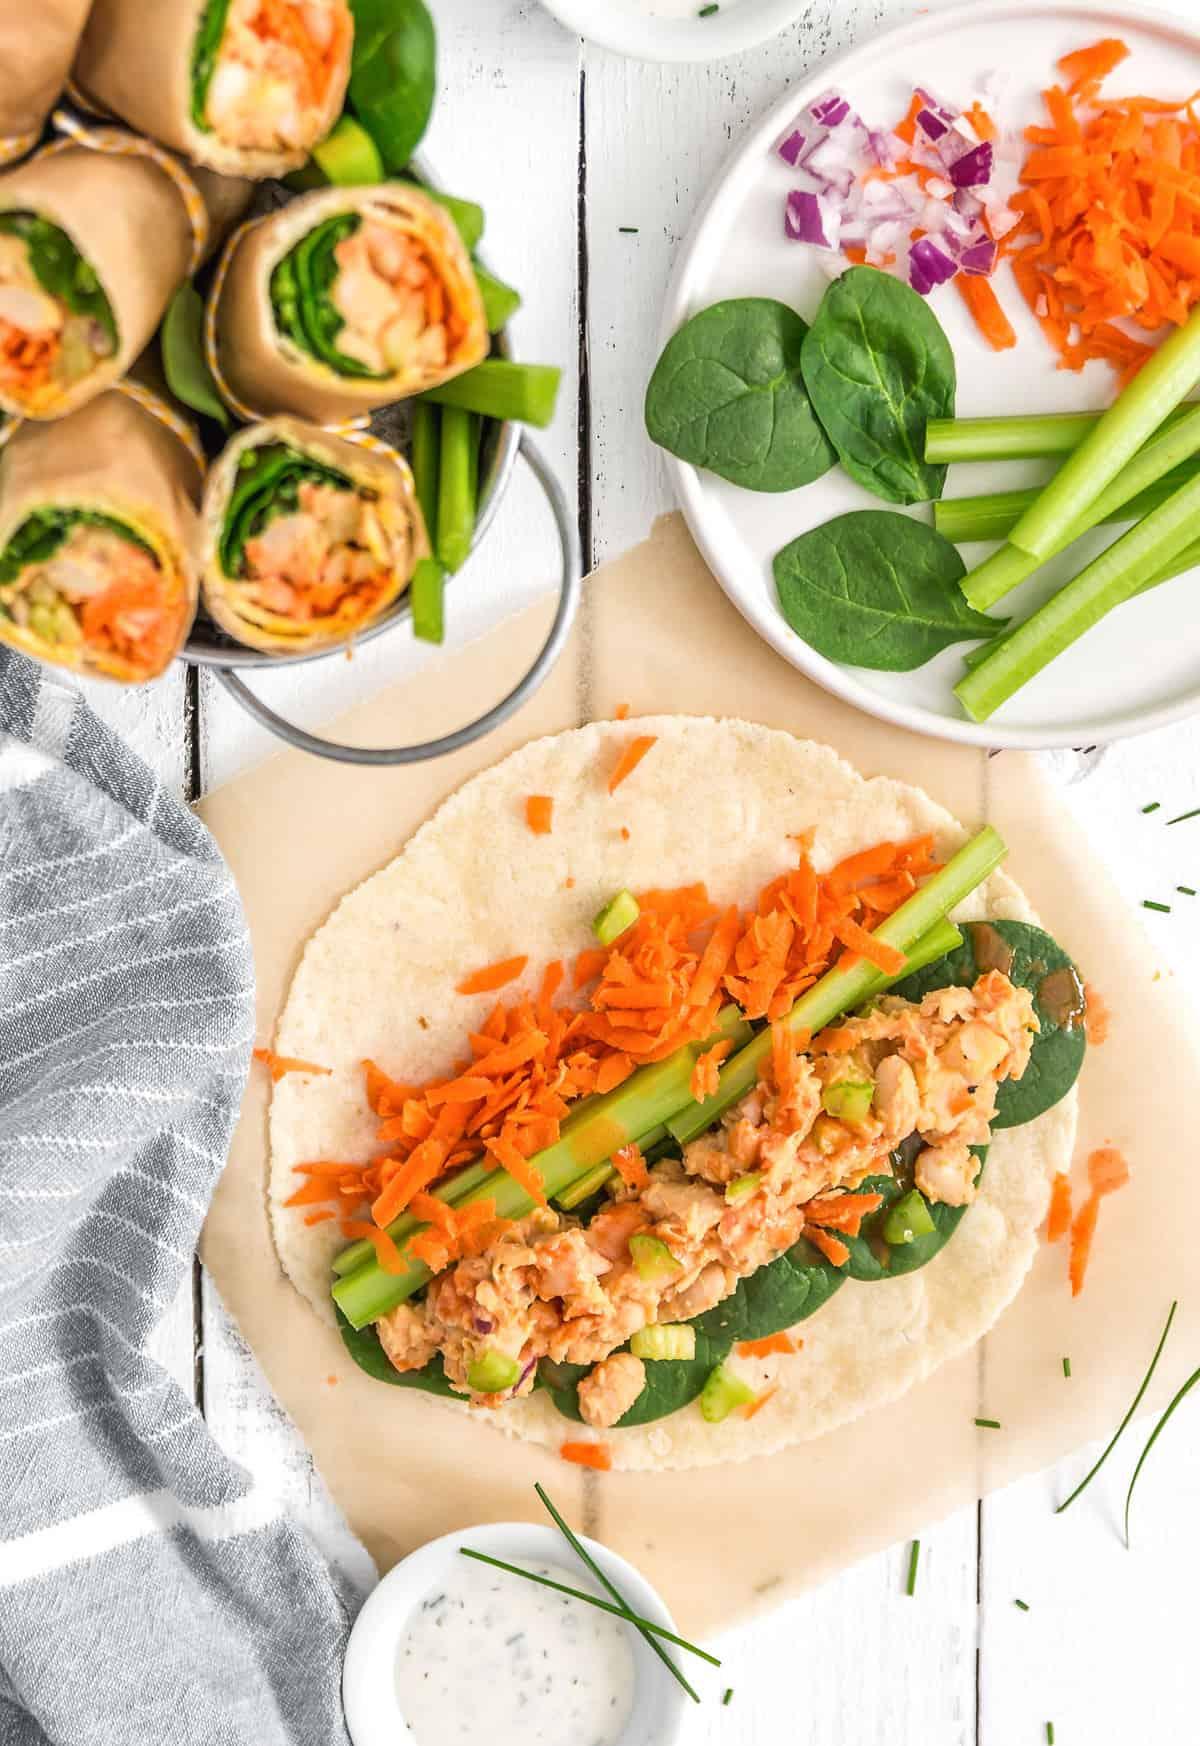 Vegan Buffalo Bean Wrap, Vegan Buffalo Bean Burrito, buffalo sauce, vegan wrap, vegan burrito, plant based, vegan, vegetarian, whole food plant based, gluten free, recipe, wfpb, healthy, healthy vegan, oil free, no refined sugar, no oil, refined sugar free, dairy free, lunch, easy recipe, fast recipe, sides, picnic, summer recipe, picnic recipe,